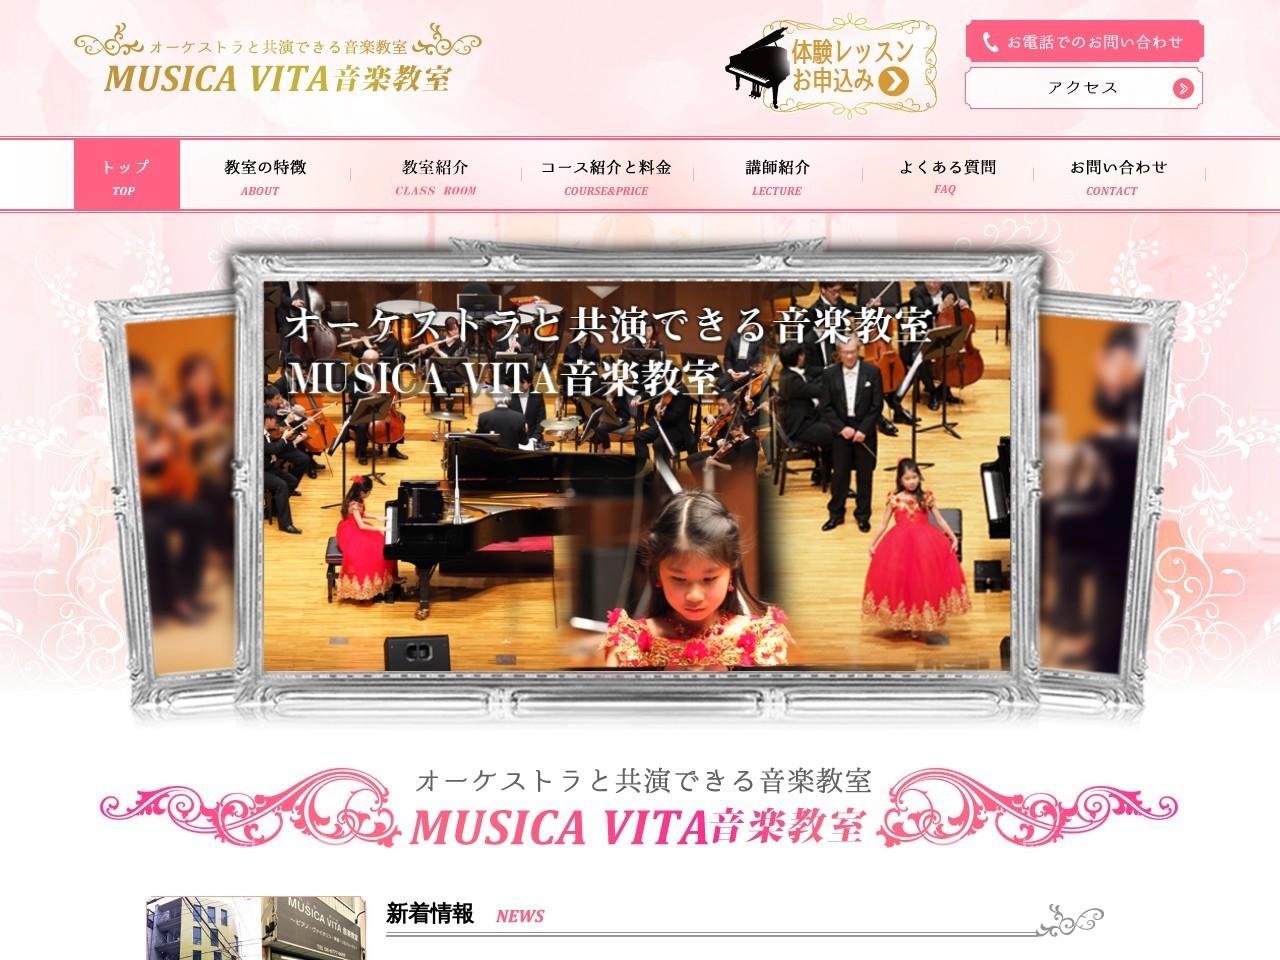 MUSICA VITA音楽教室のサムネイル